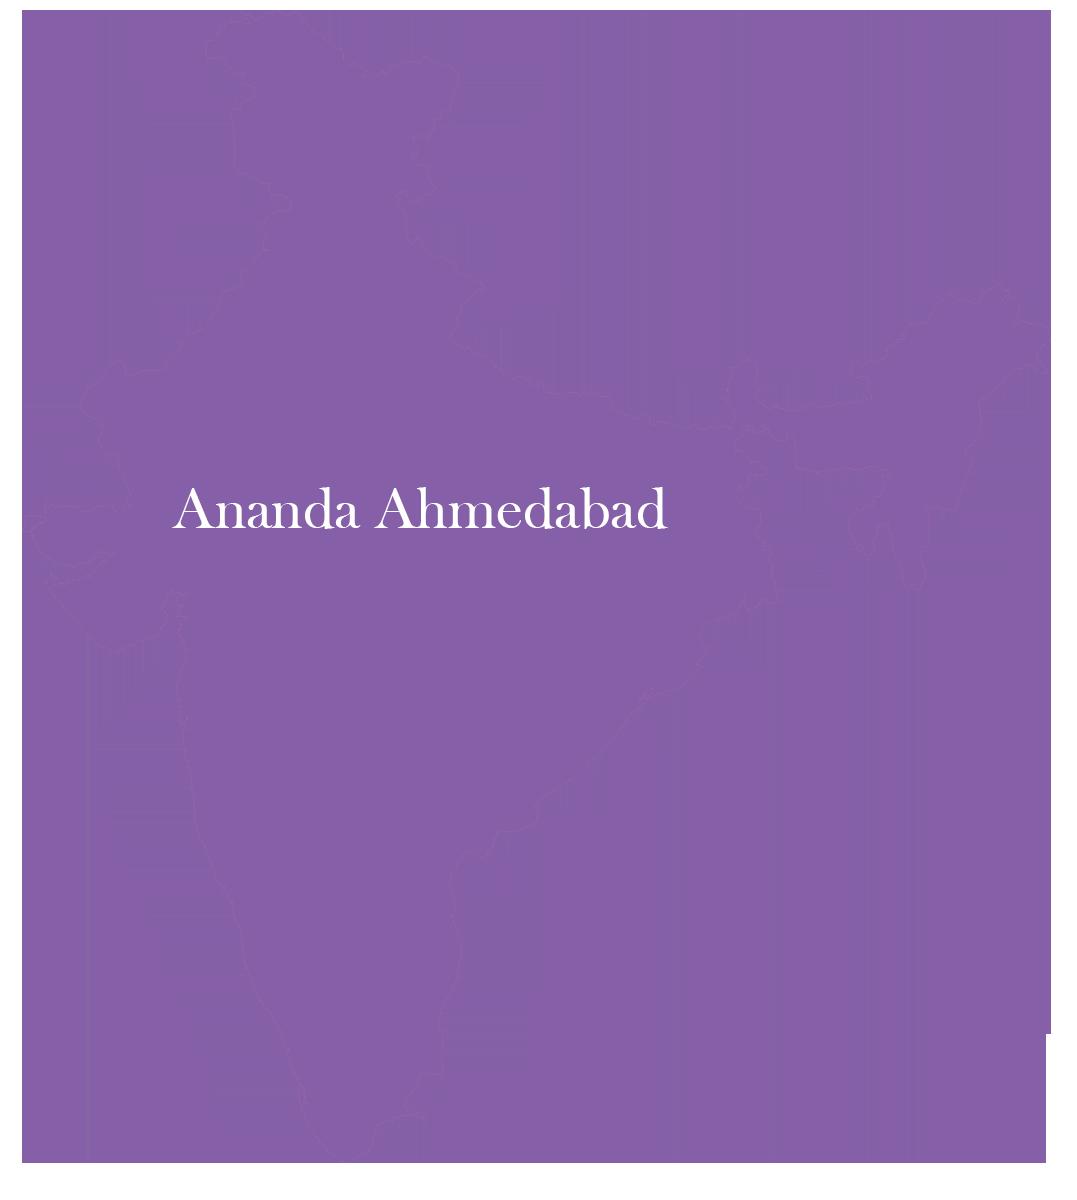 Ananda Ahmedabad